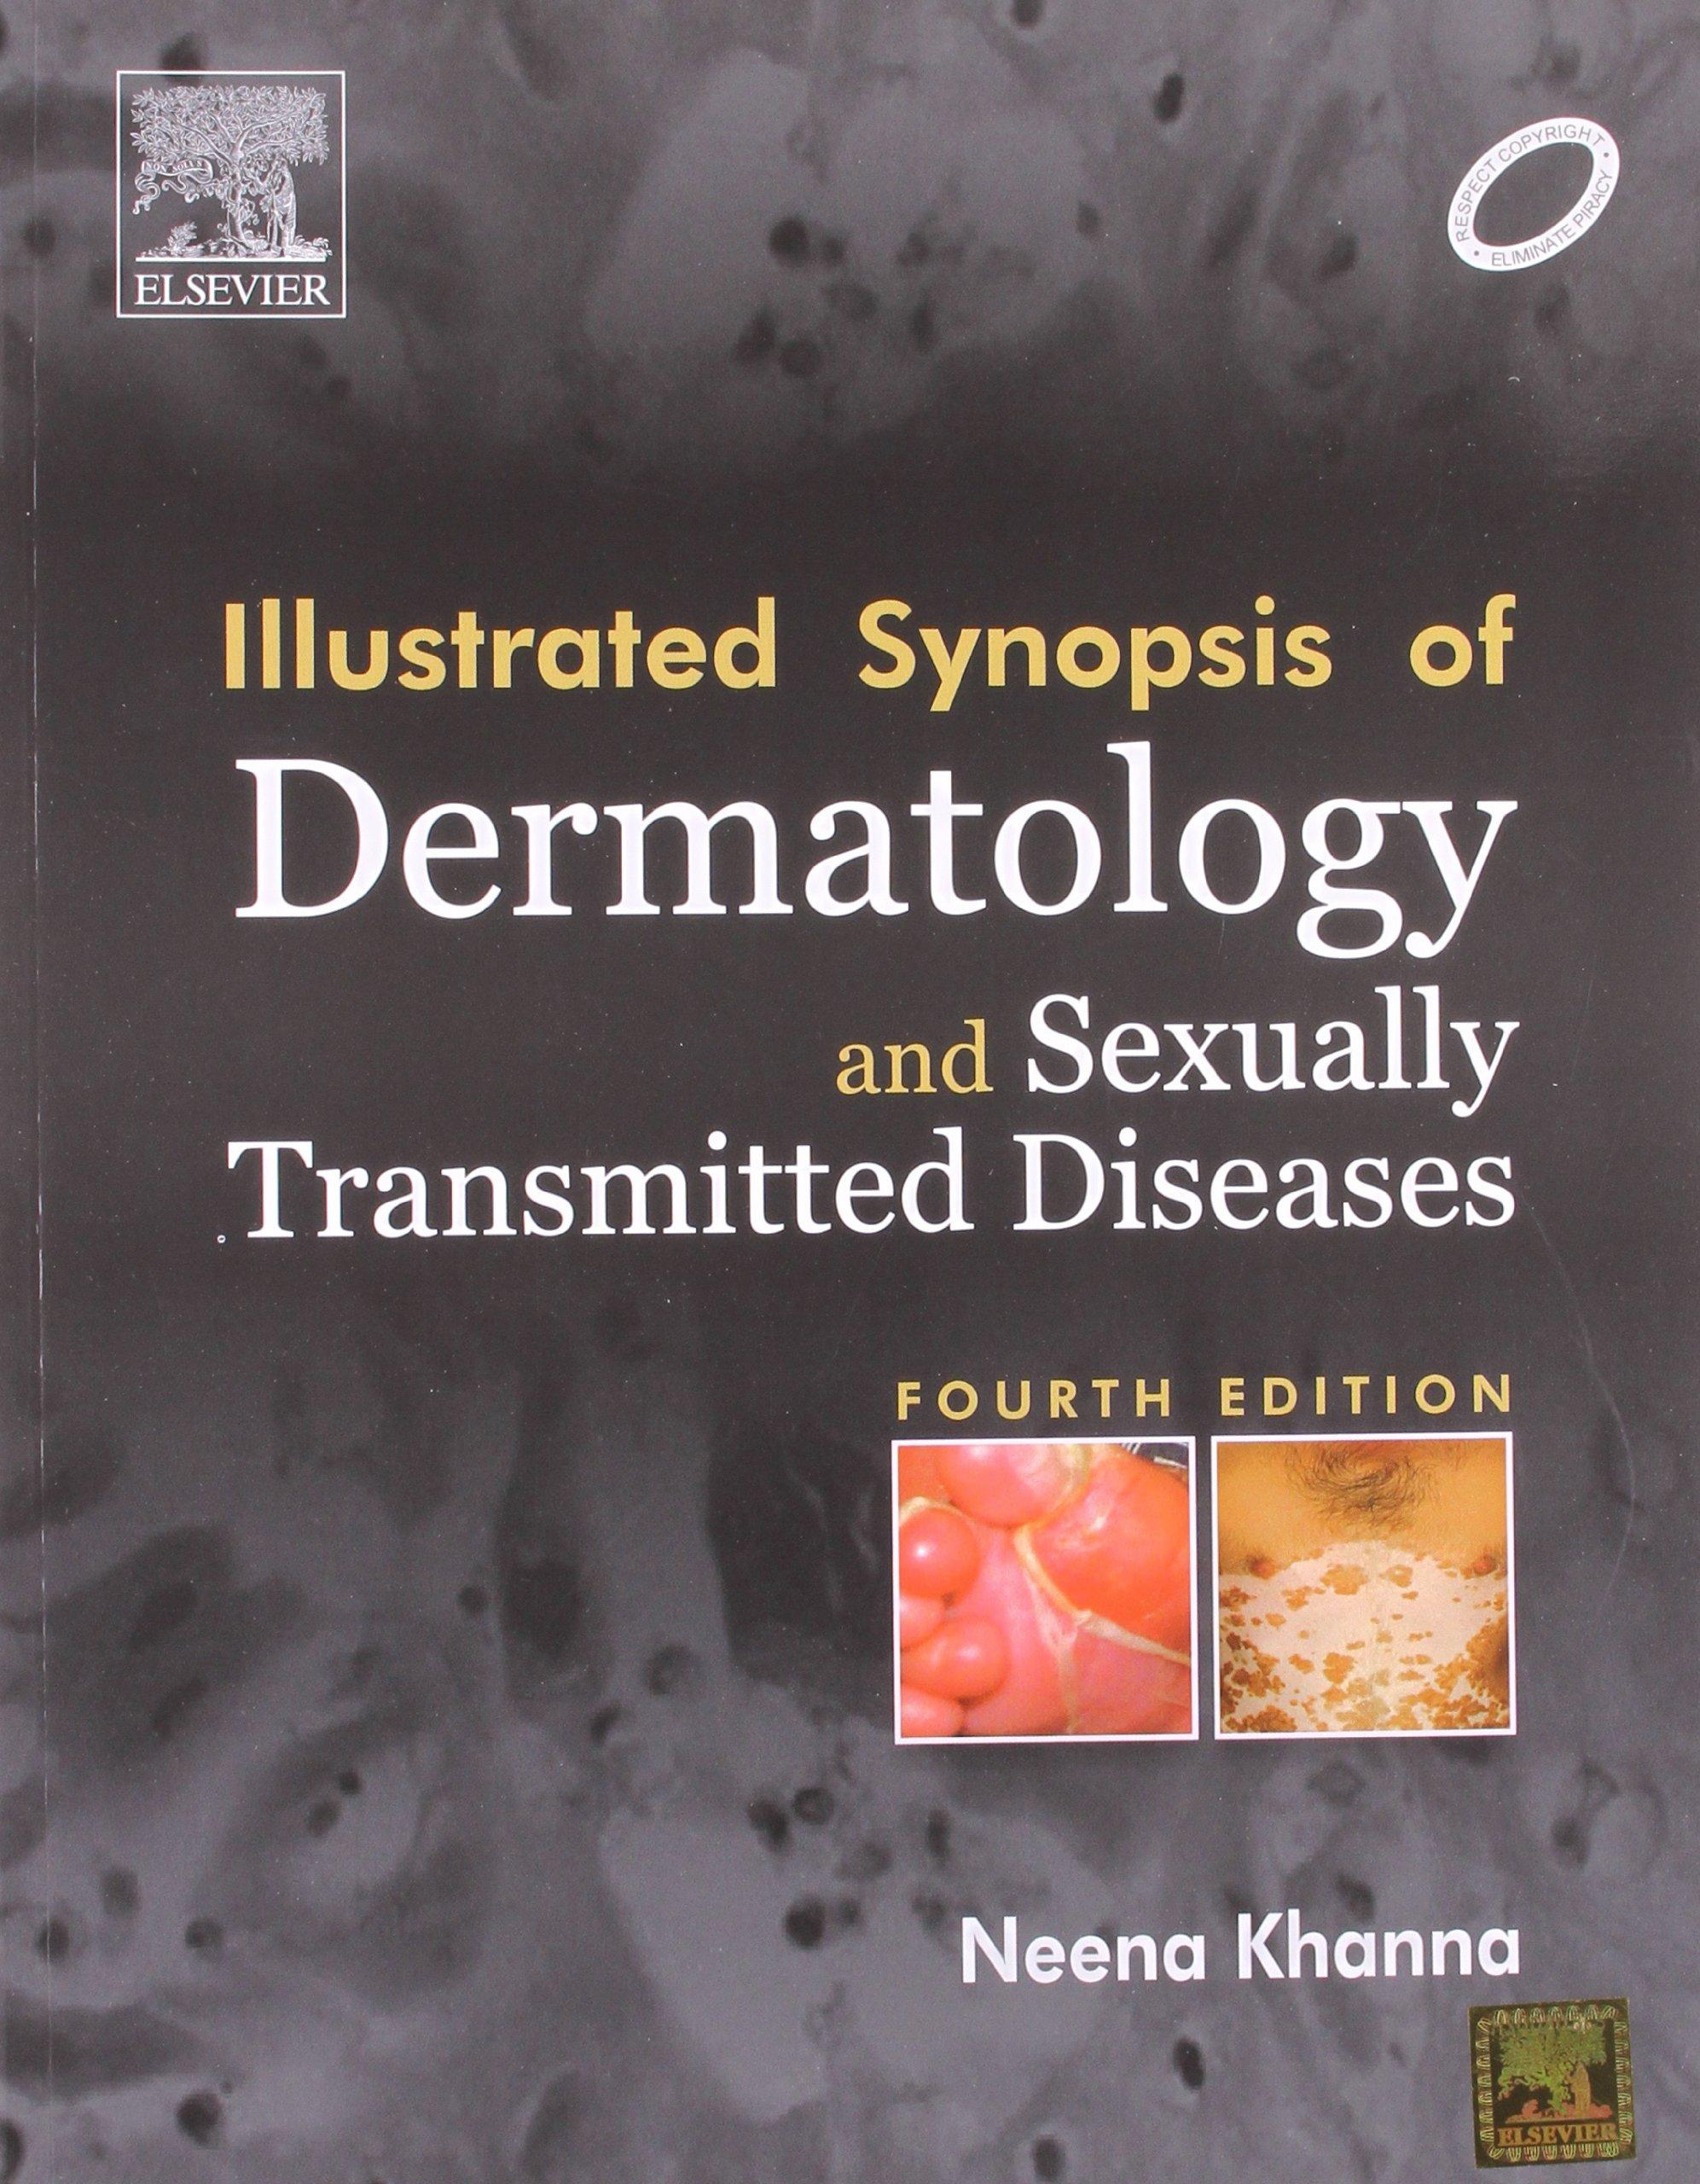 Read e-book procedural dermatology marc avram [pdf free download].